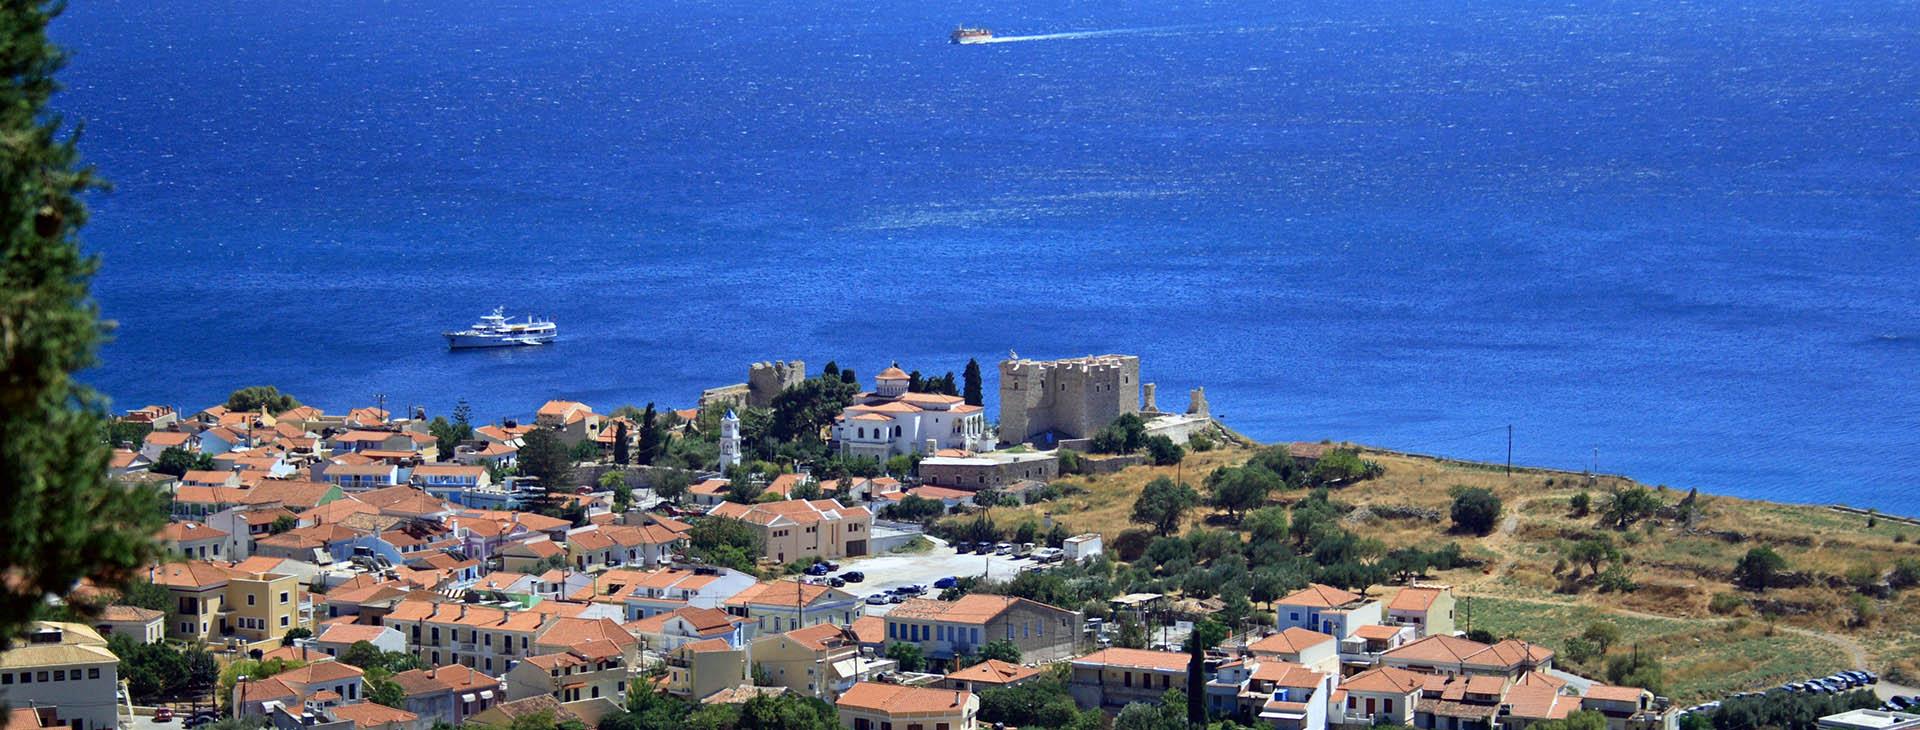 Samos island